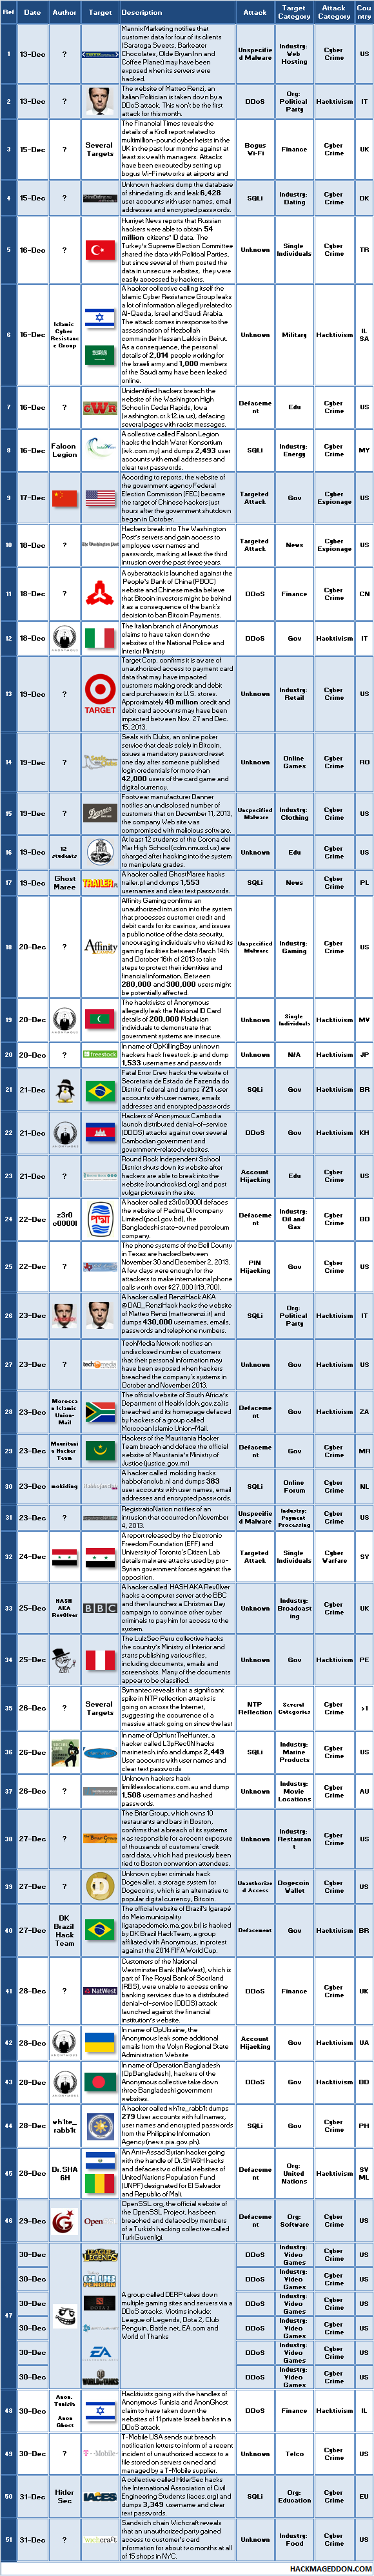 16-31 December 2013 Cyber Attacks Timeline Update2